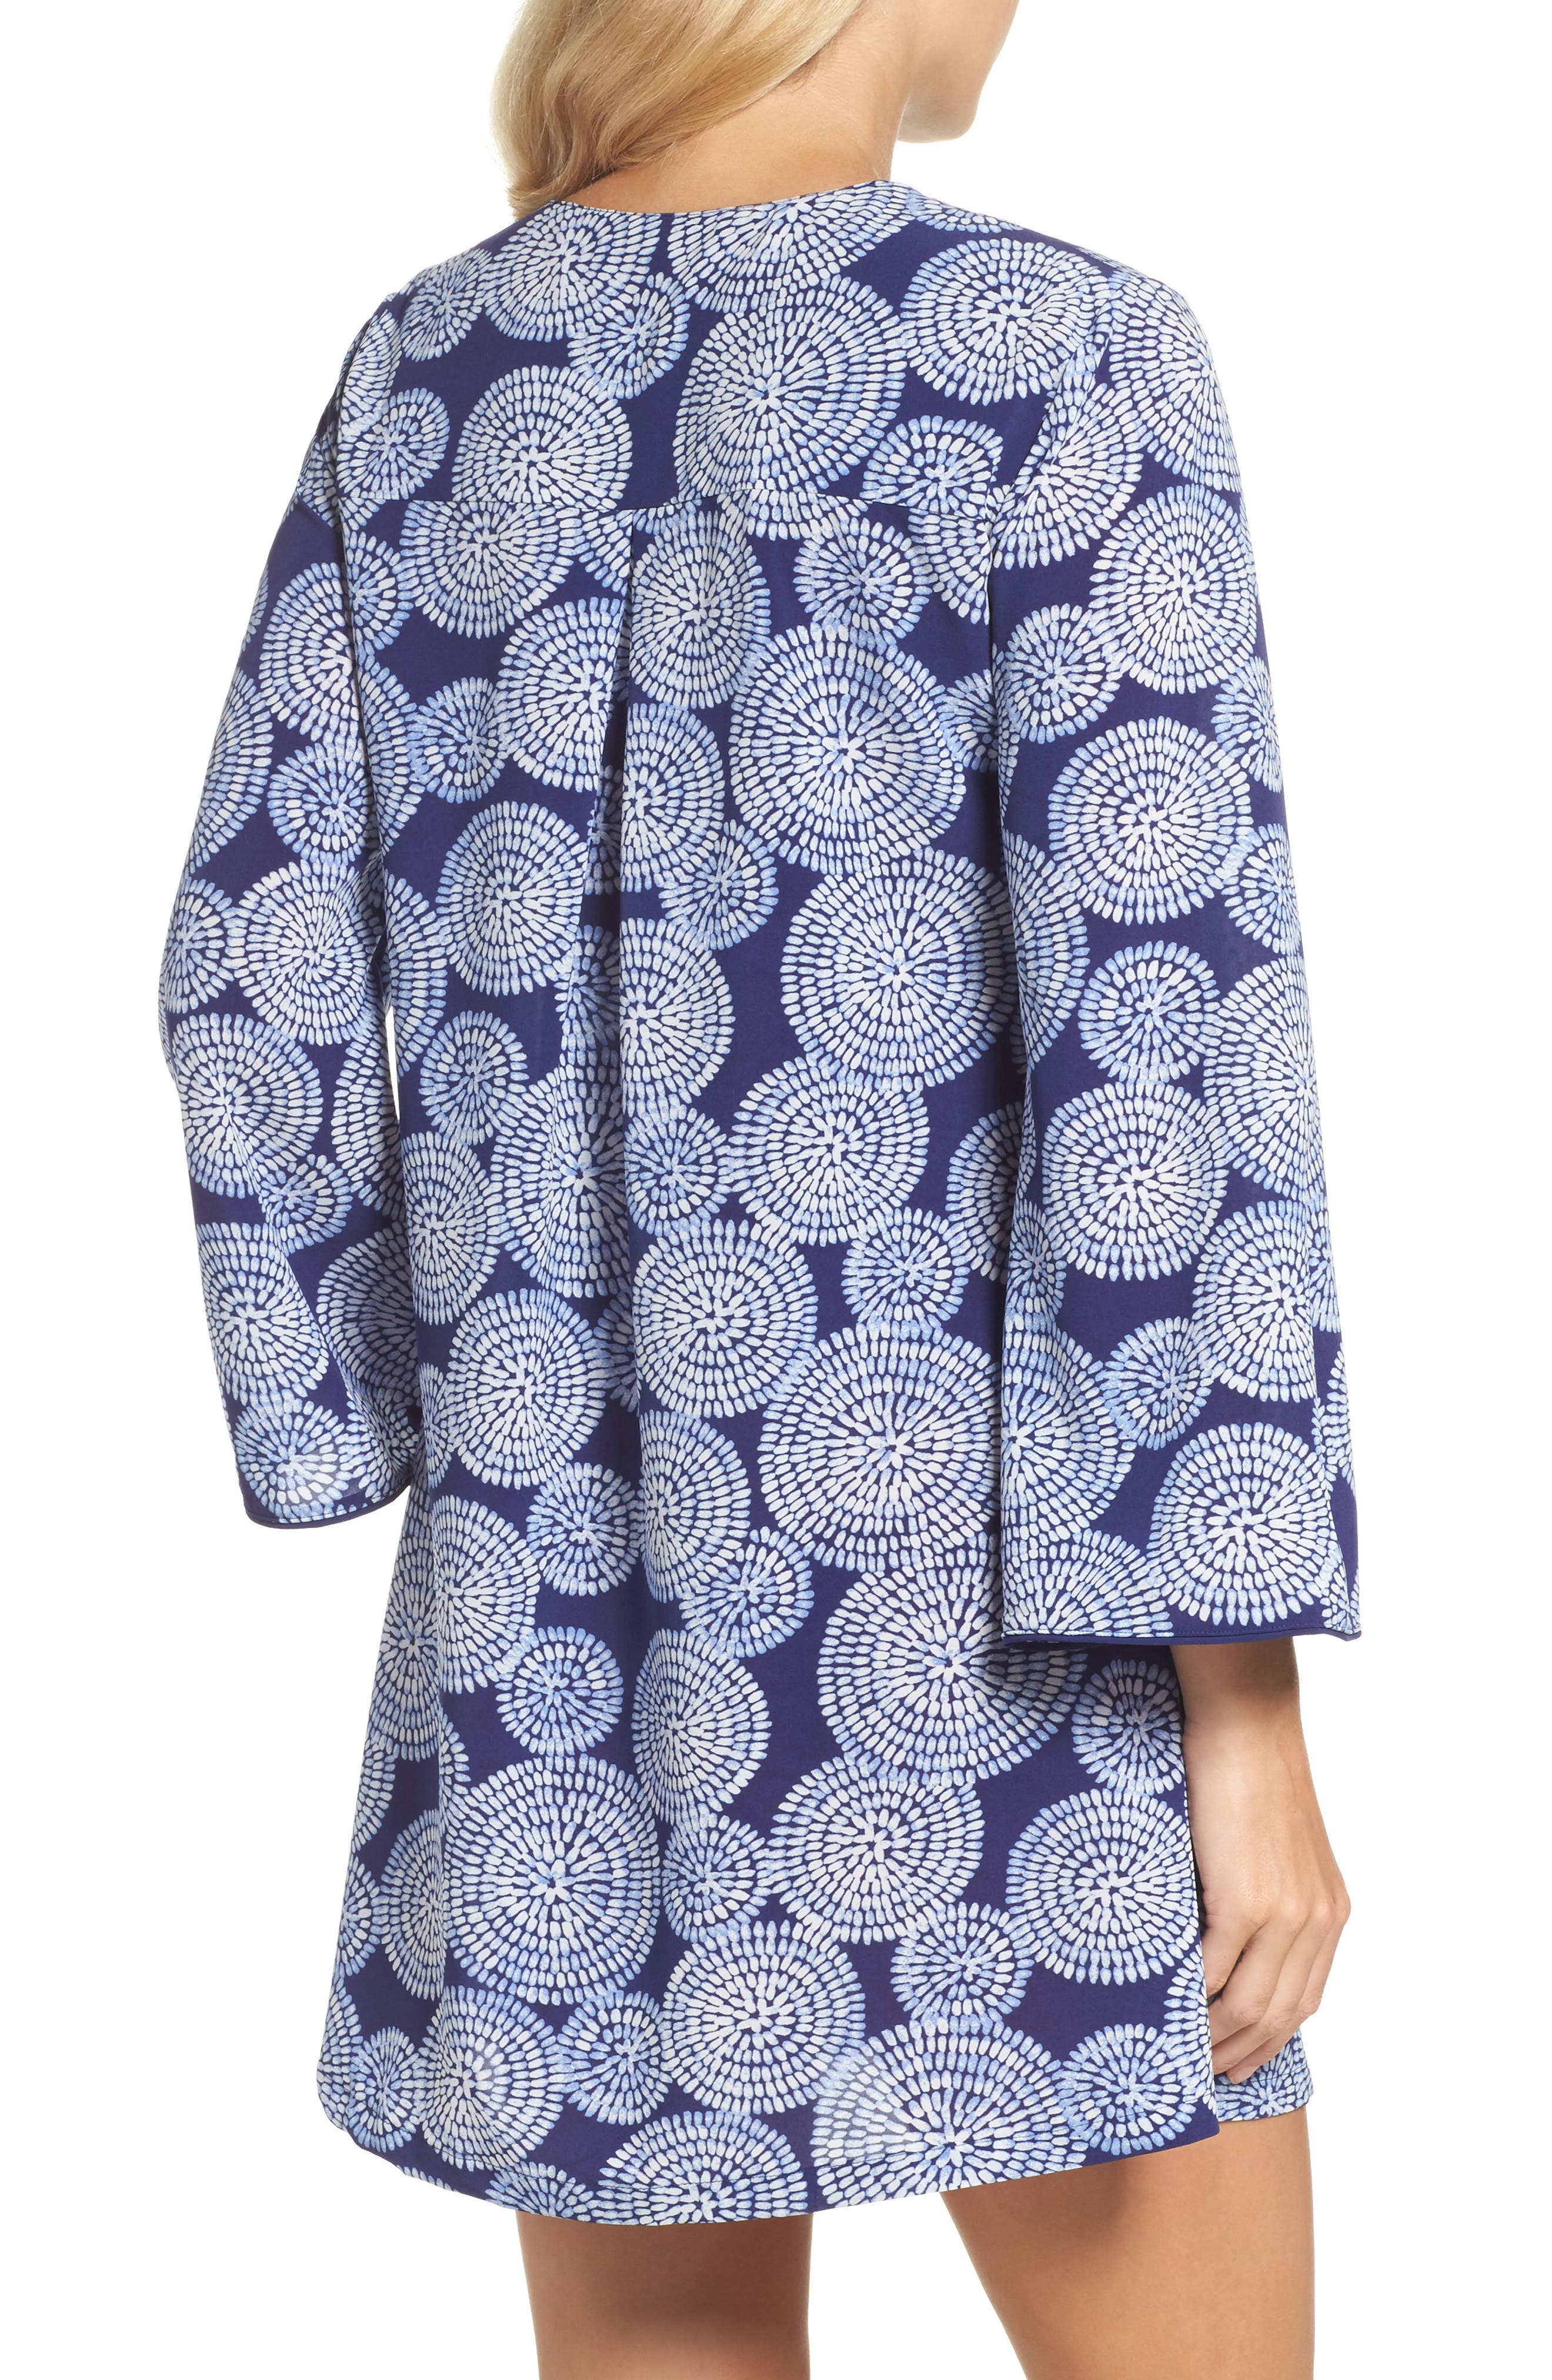 Sleepwear Halftan Short Nightgown,                             Alternate thumbnail 2, color,                             Eclipse Print